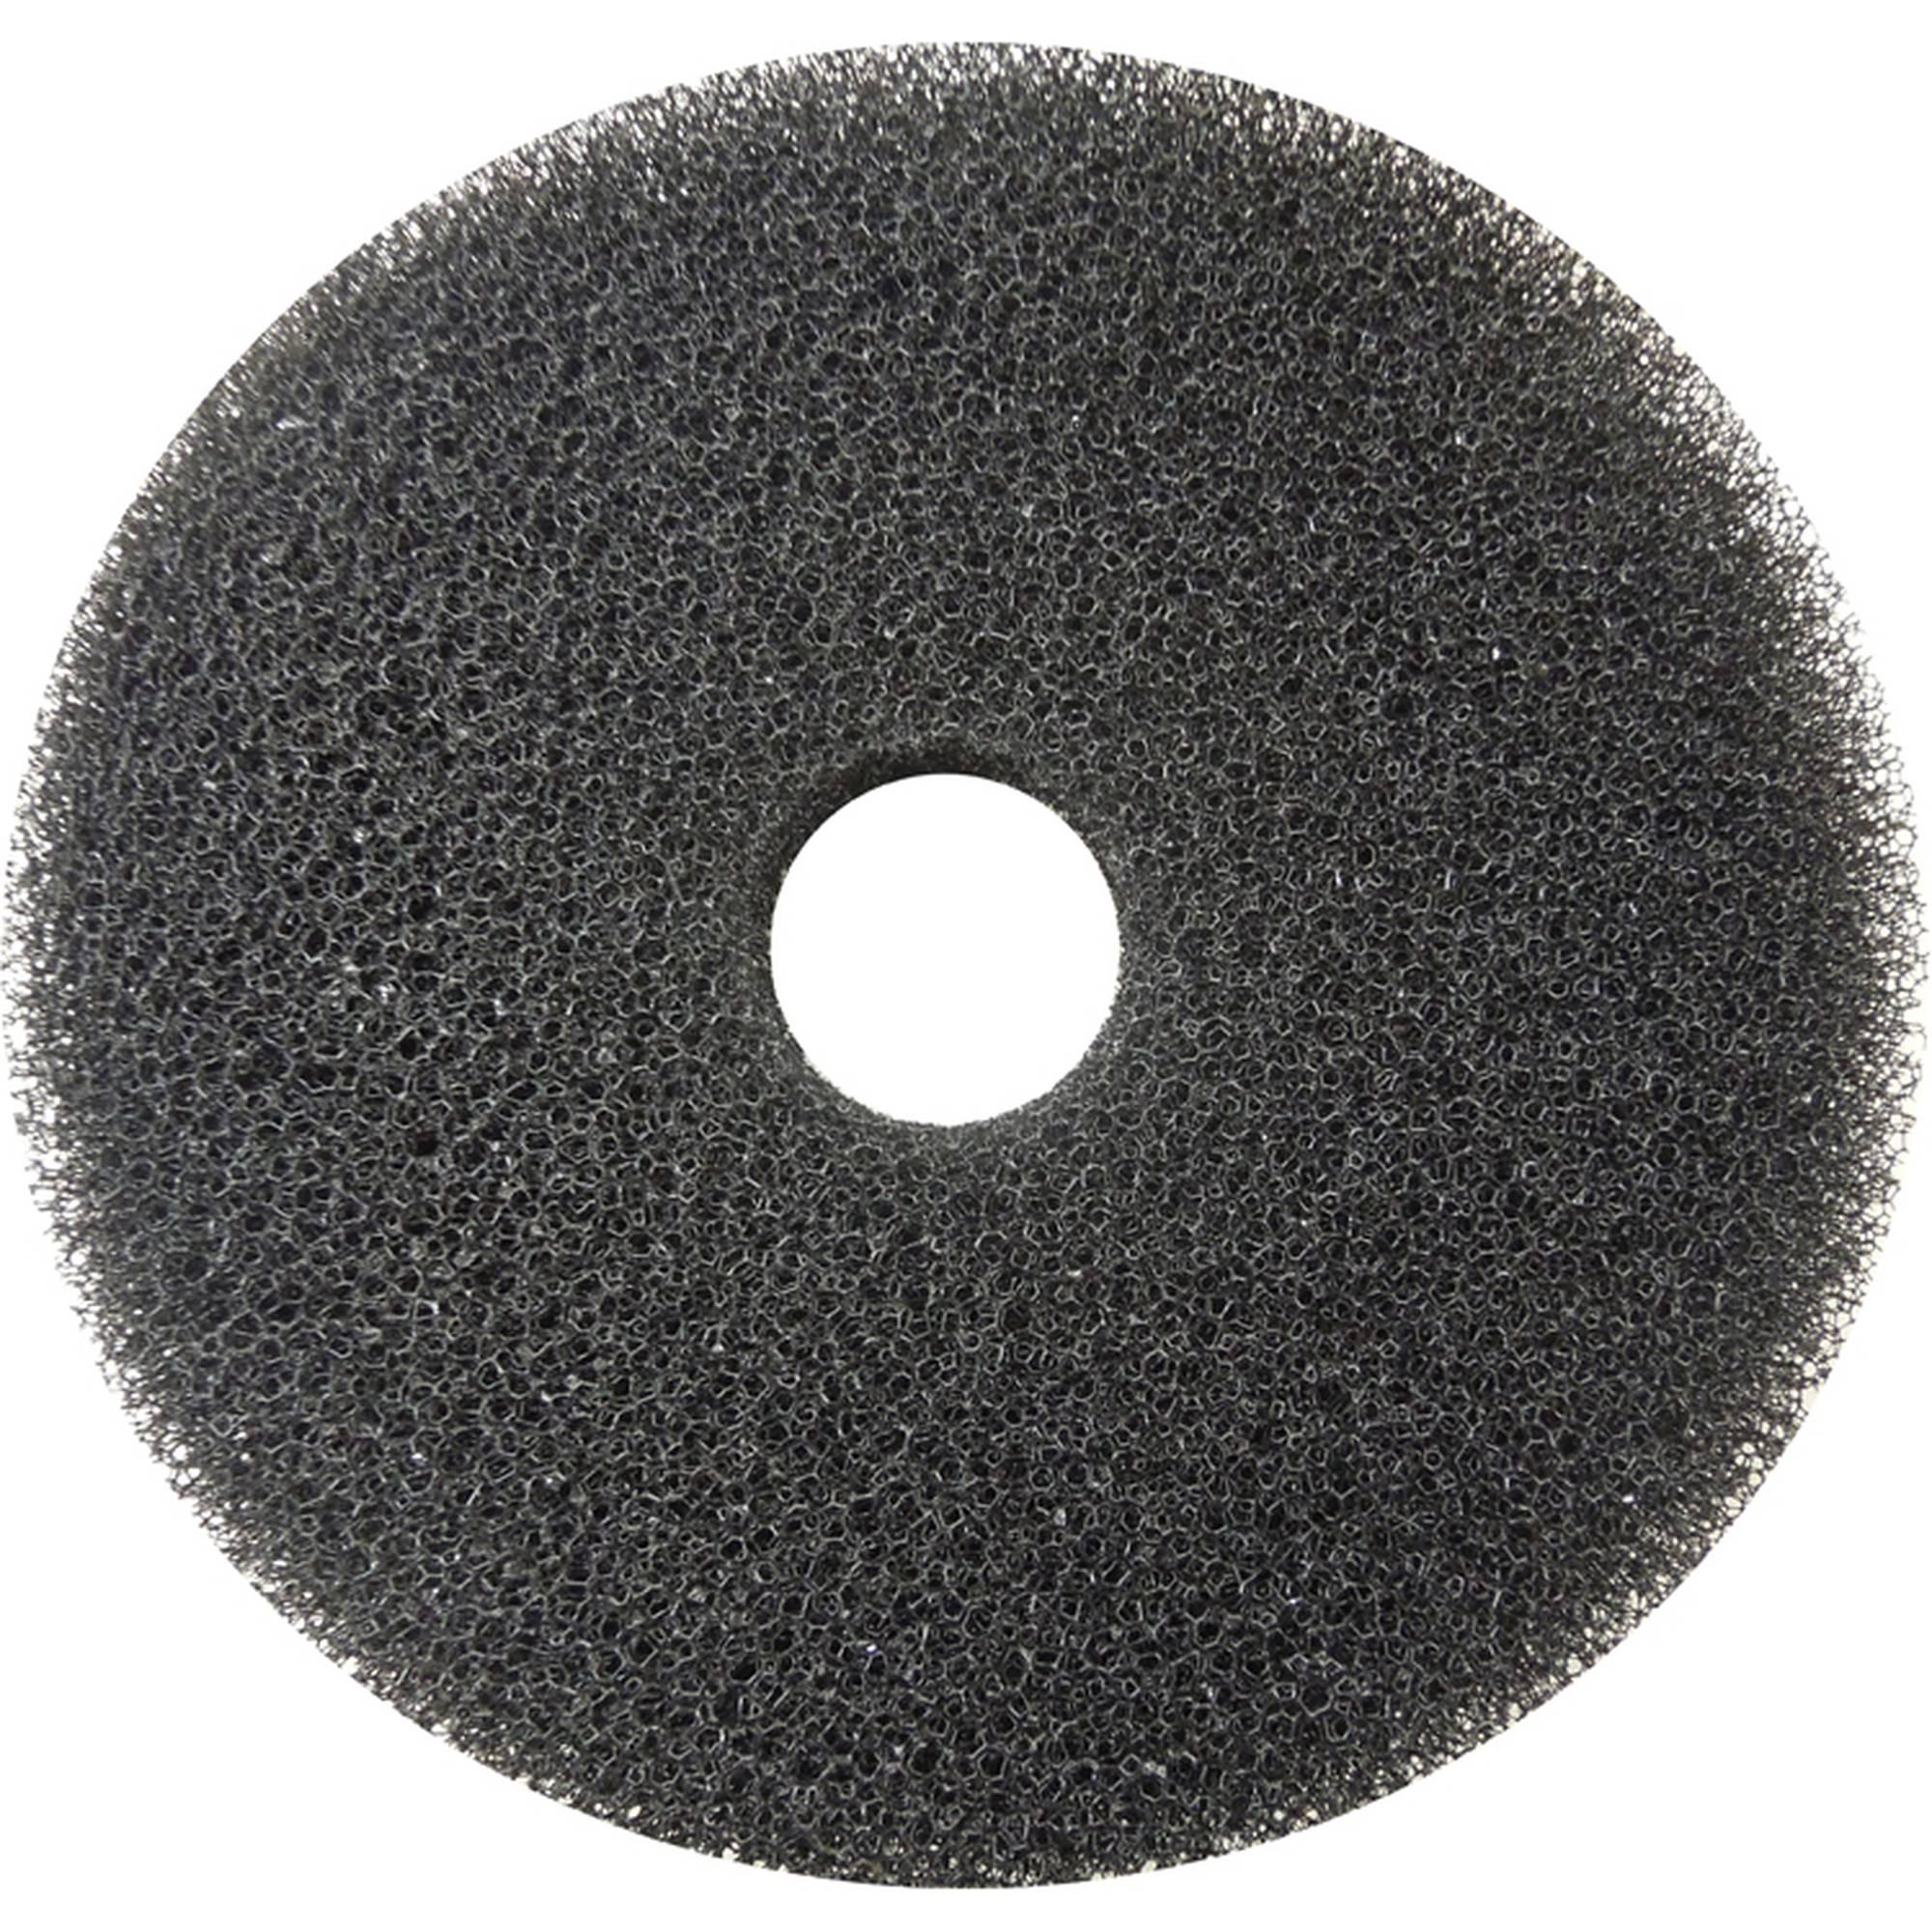 Filterschwamm,grob,schwarz FPU7500